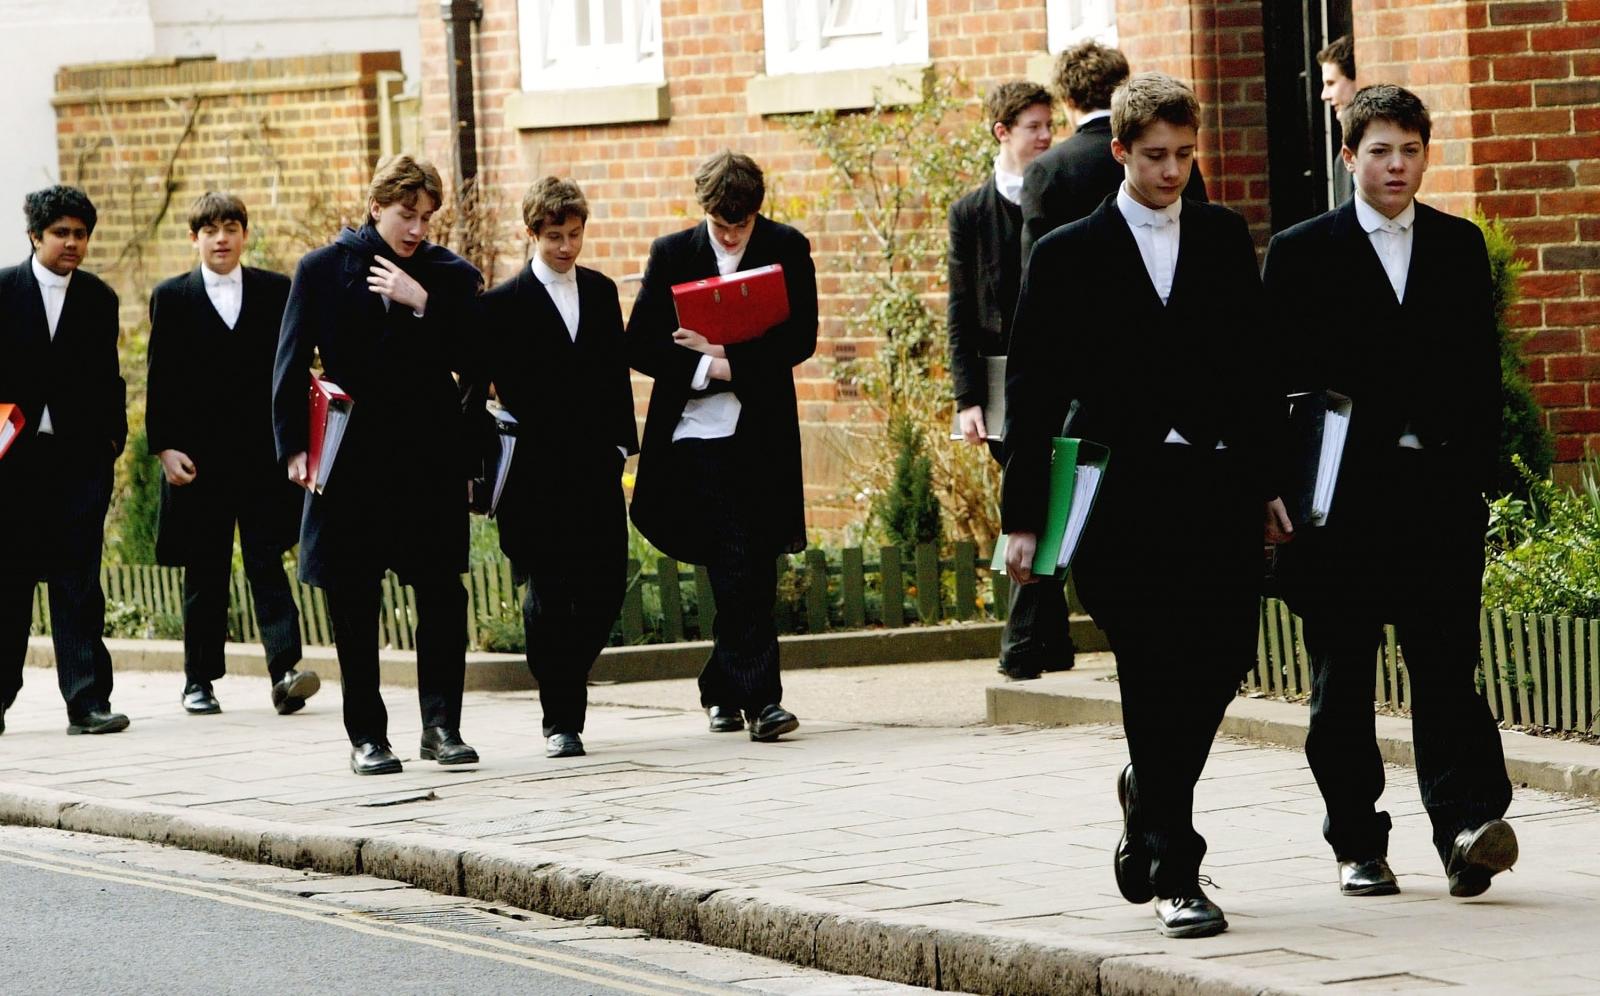 Eton college pupils